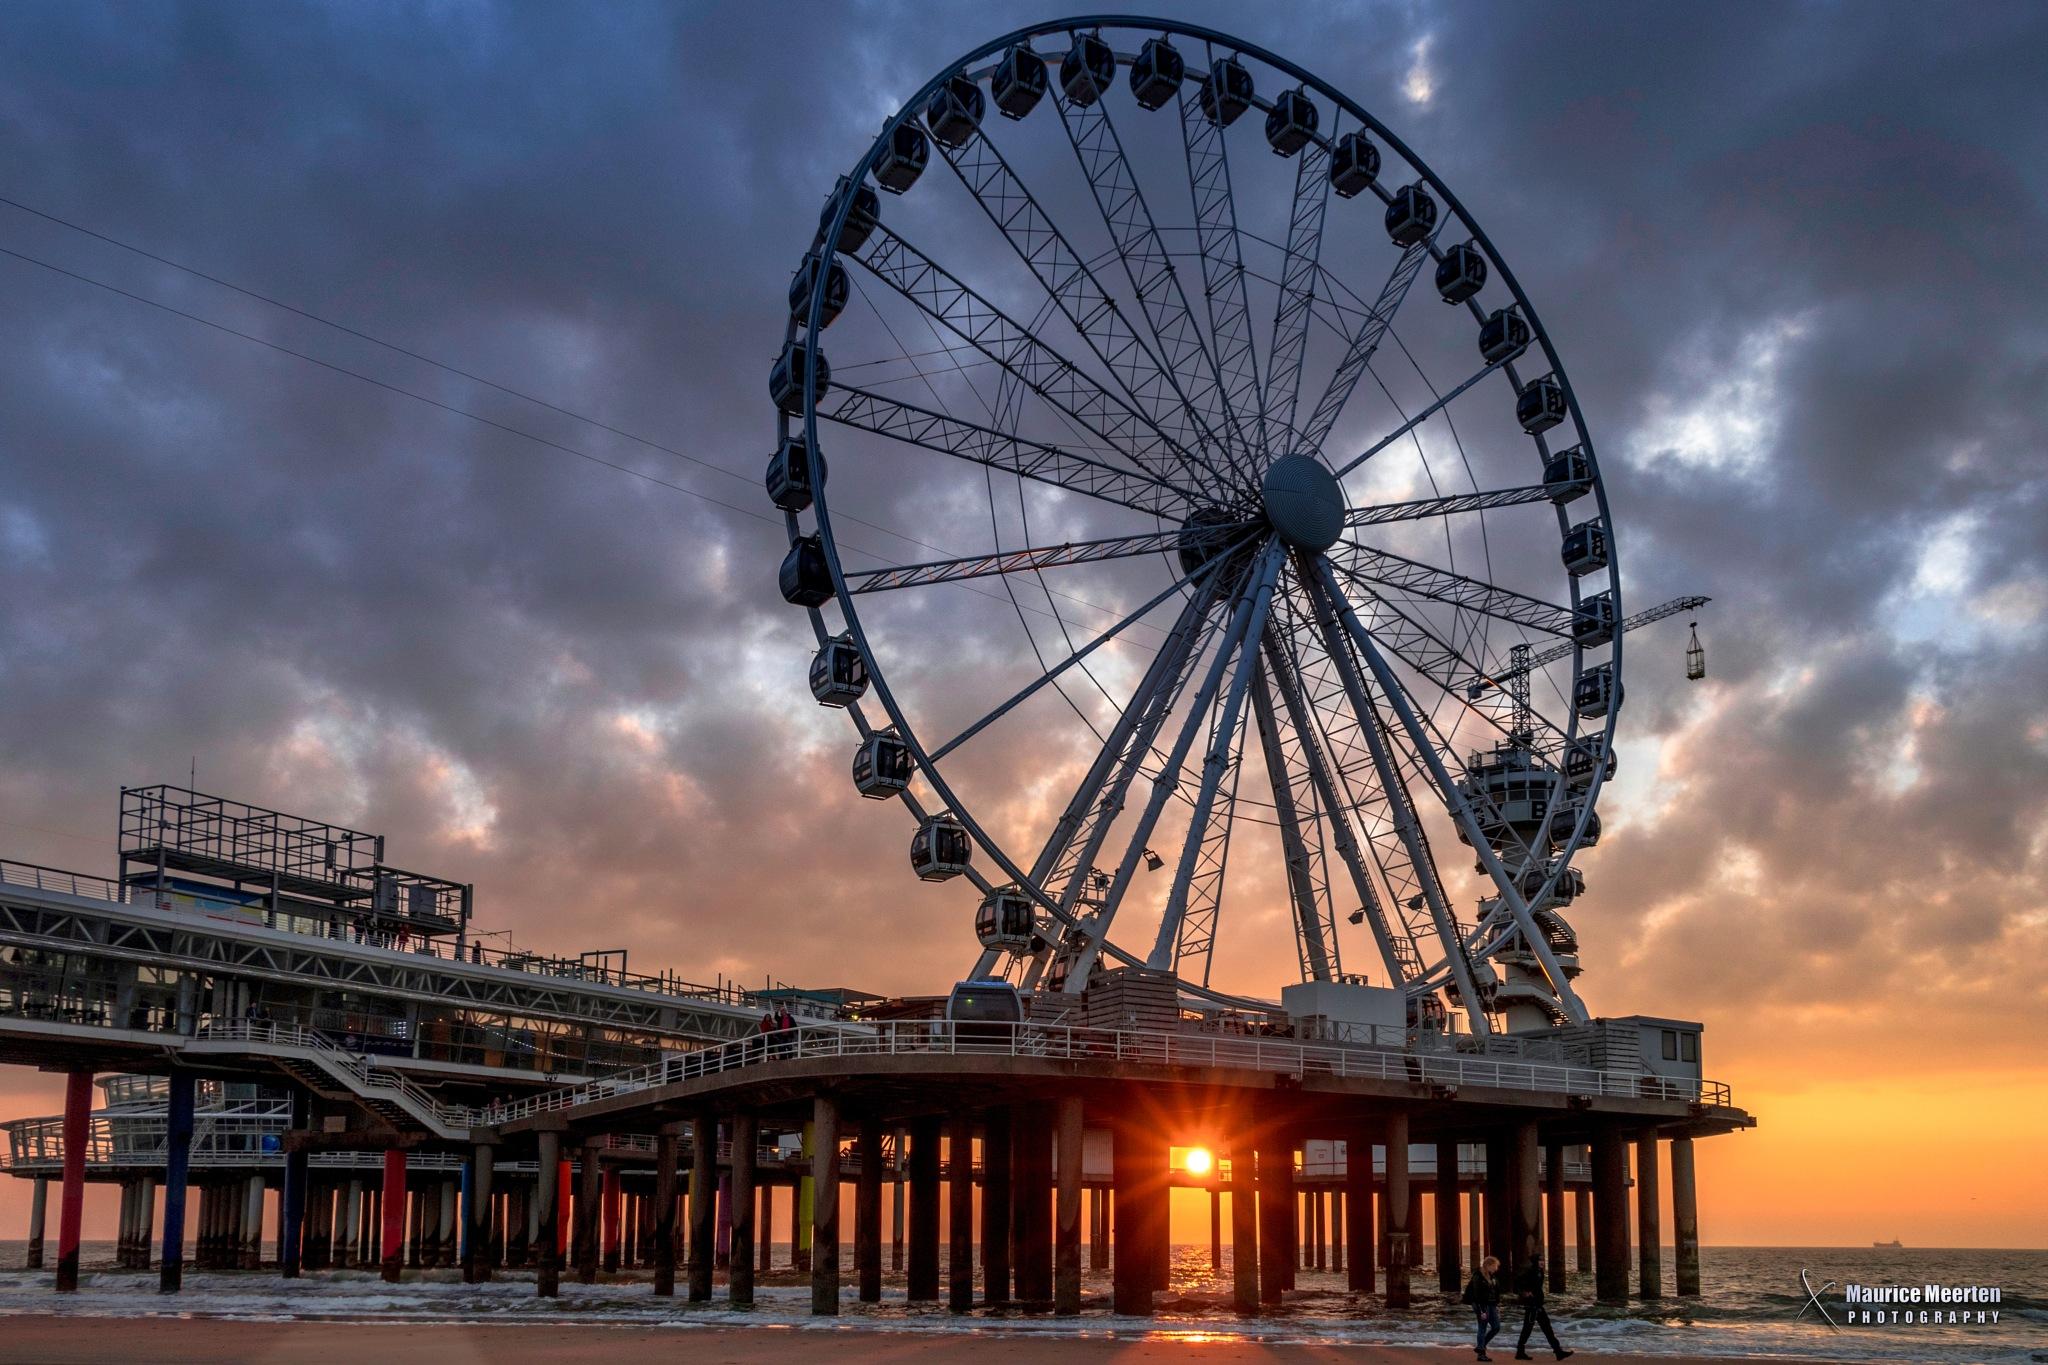 Scheveningen Ferris wheel by Maurice Meerten